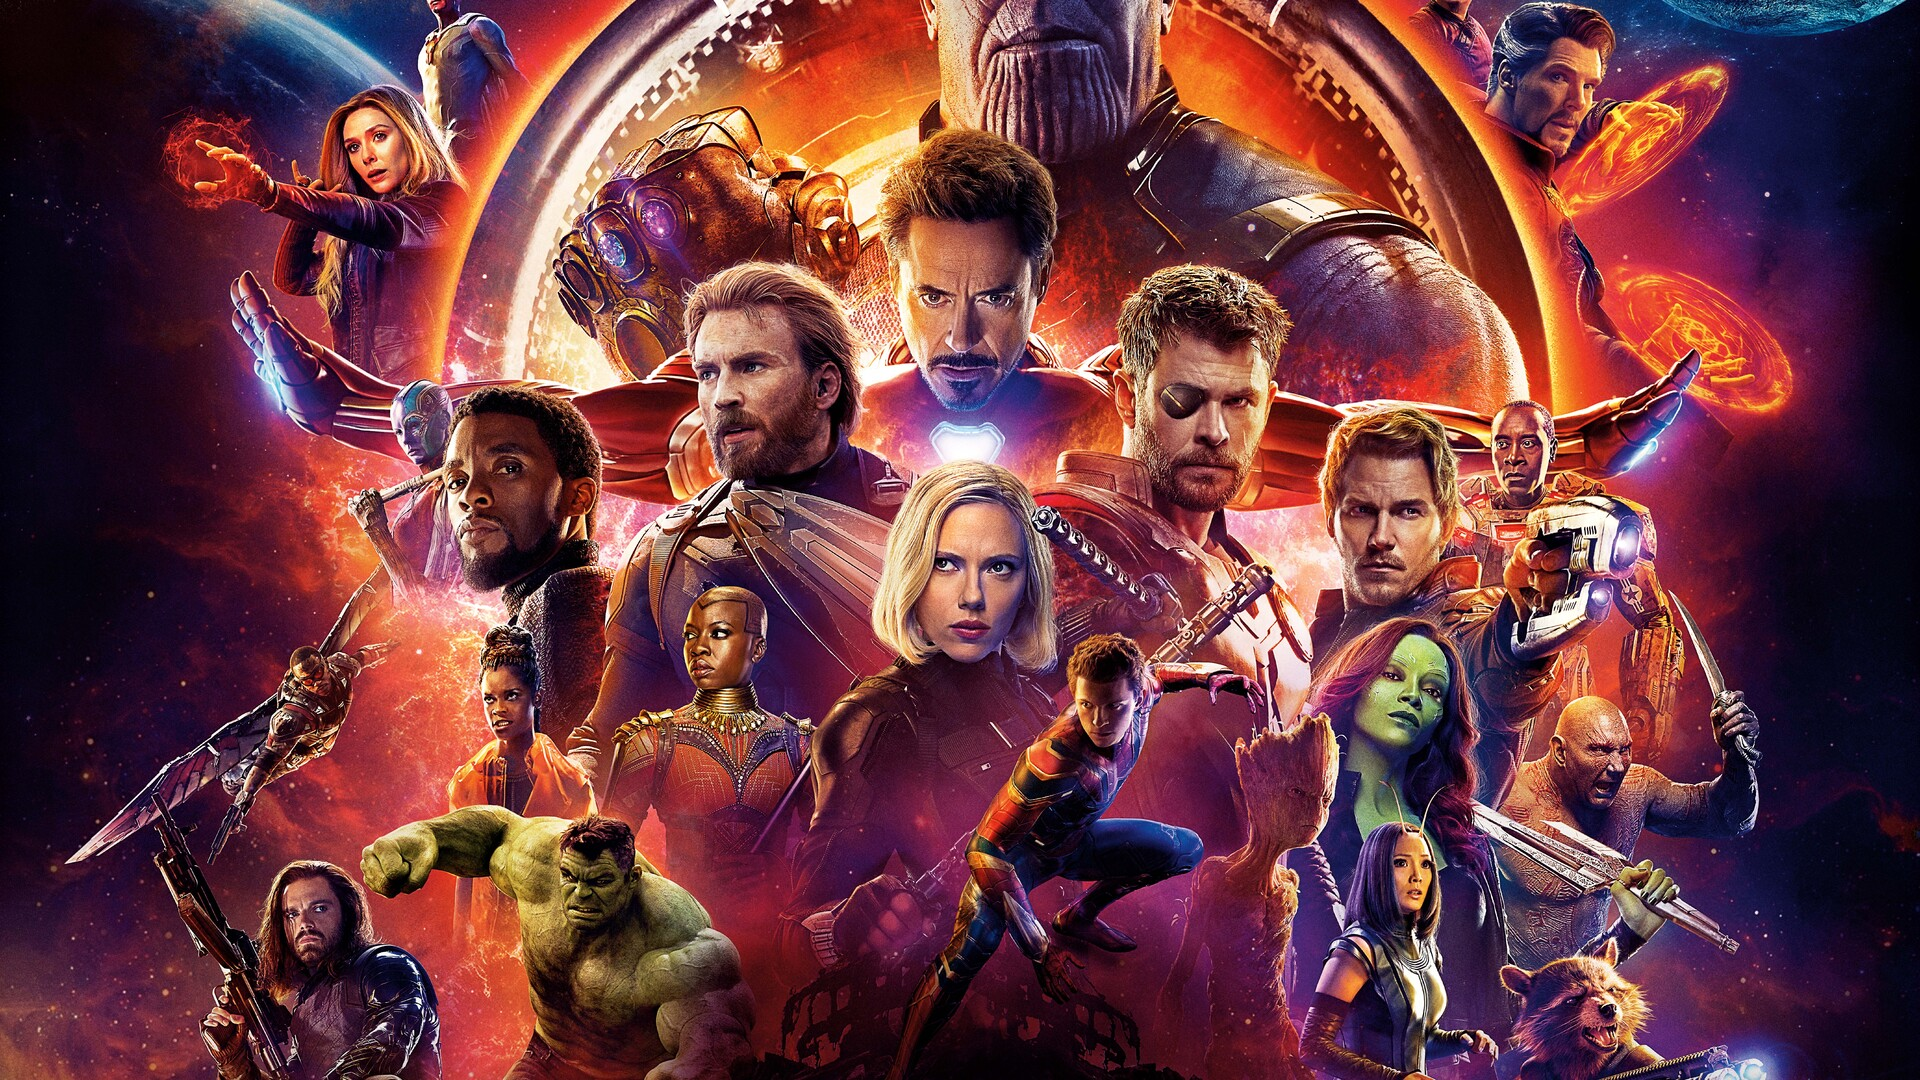 1920x1080 Avengers Infinity War 2018 10k Poster Laptop Full Hd 1080p